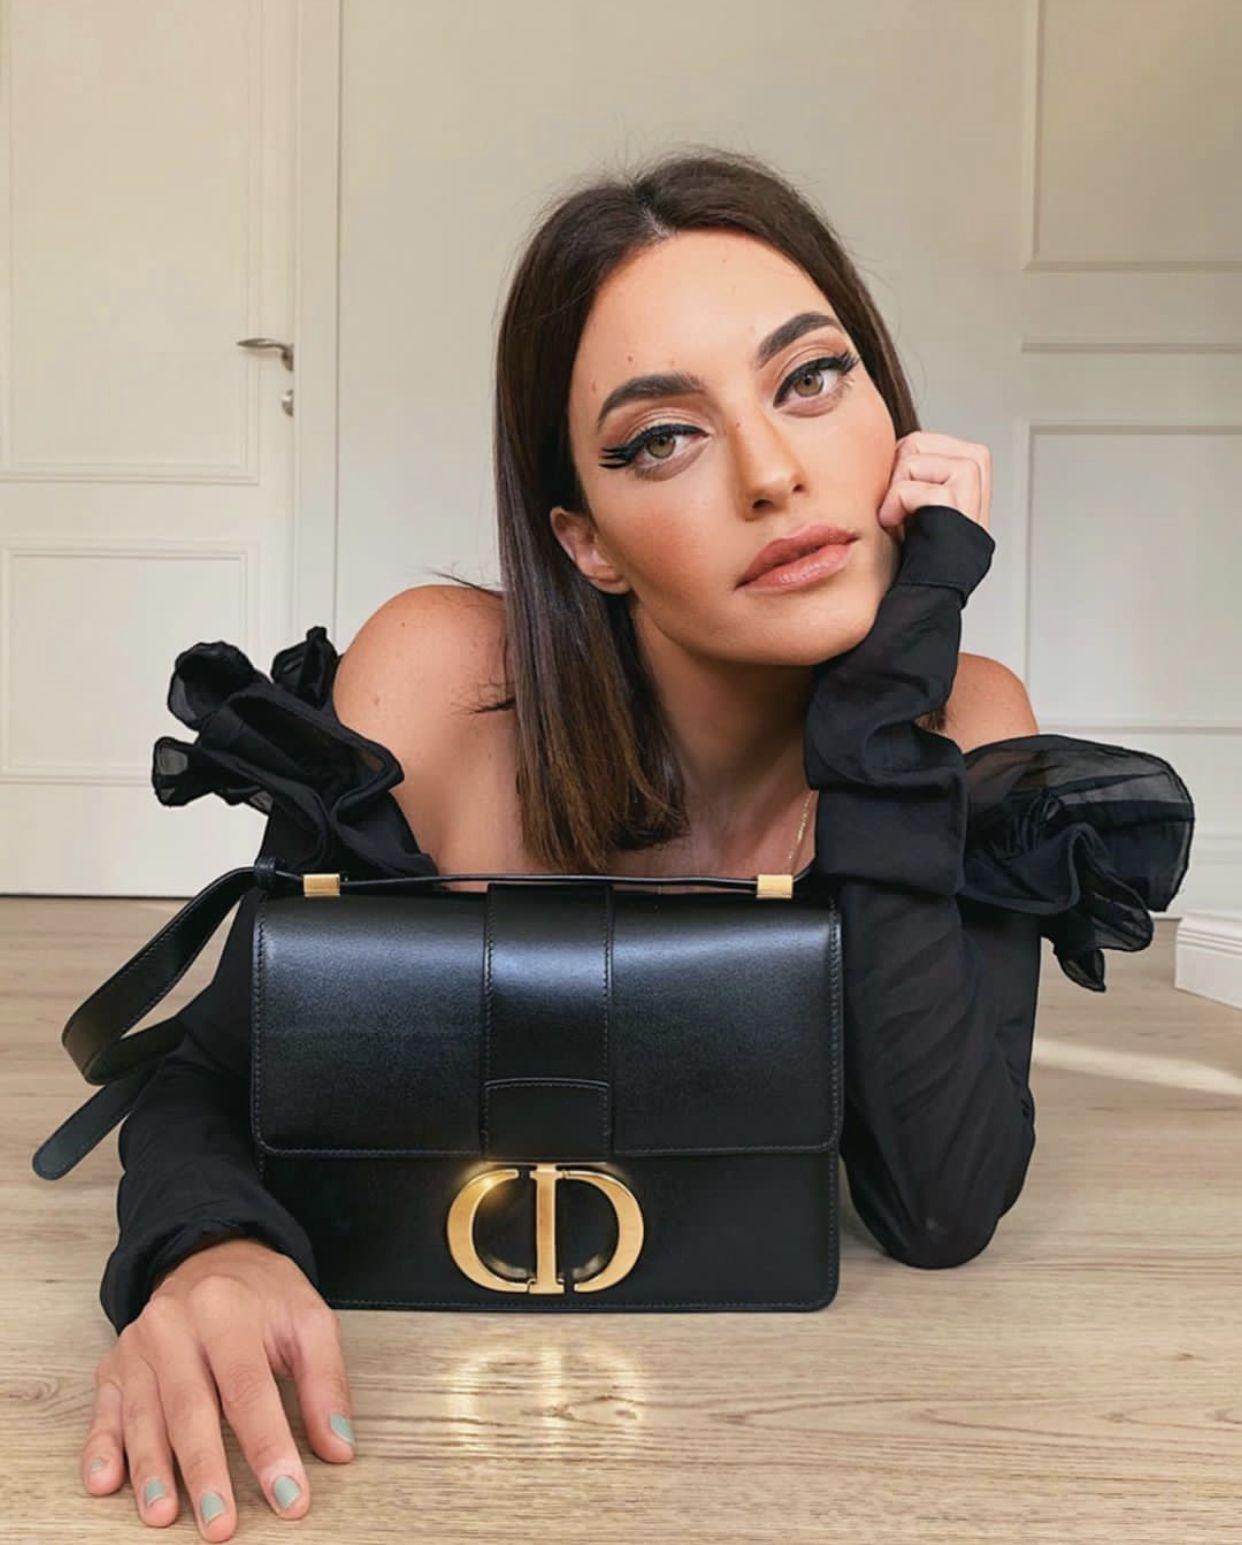 653fd86c99 30 Montaigne calfskin bag in 2019 | The Dior 30 Montaigne bag | Dior ...